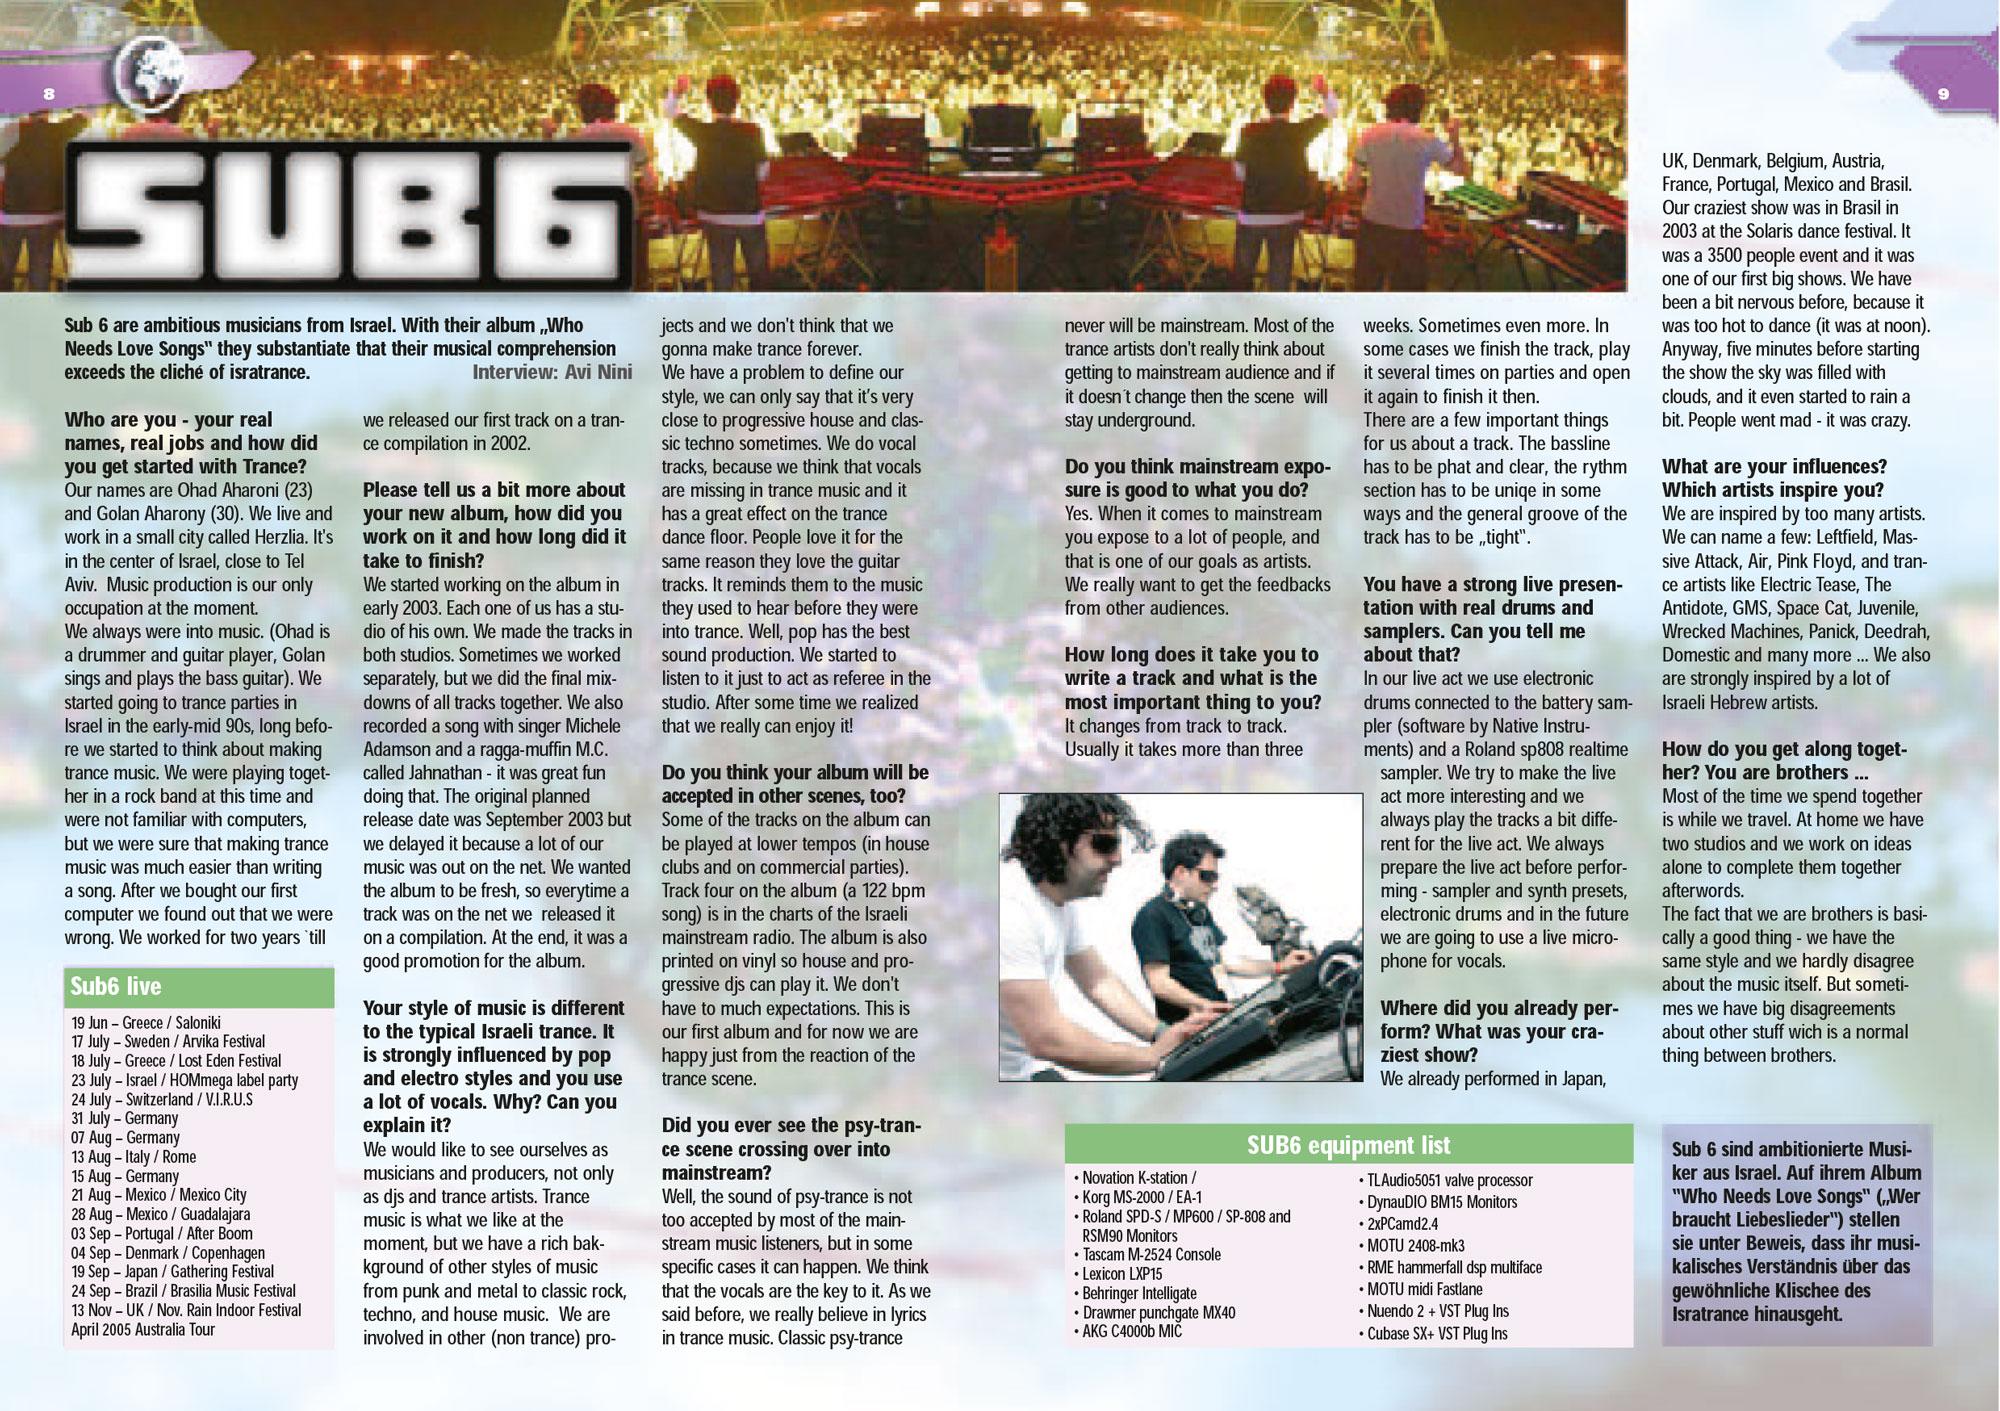 Sub6 article from mushroom magazine July 2003